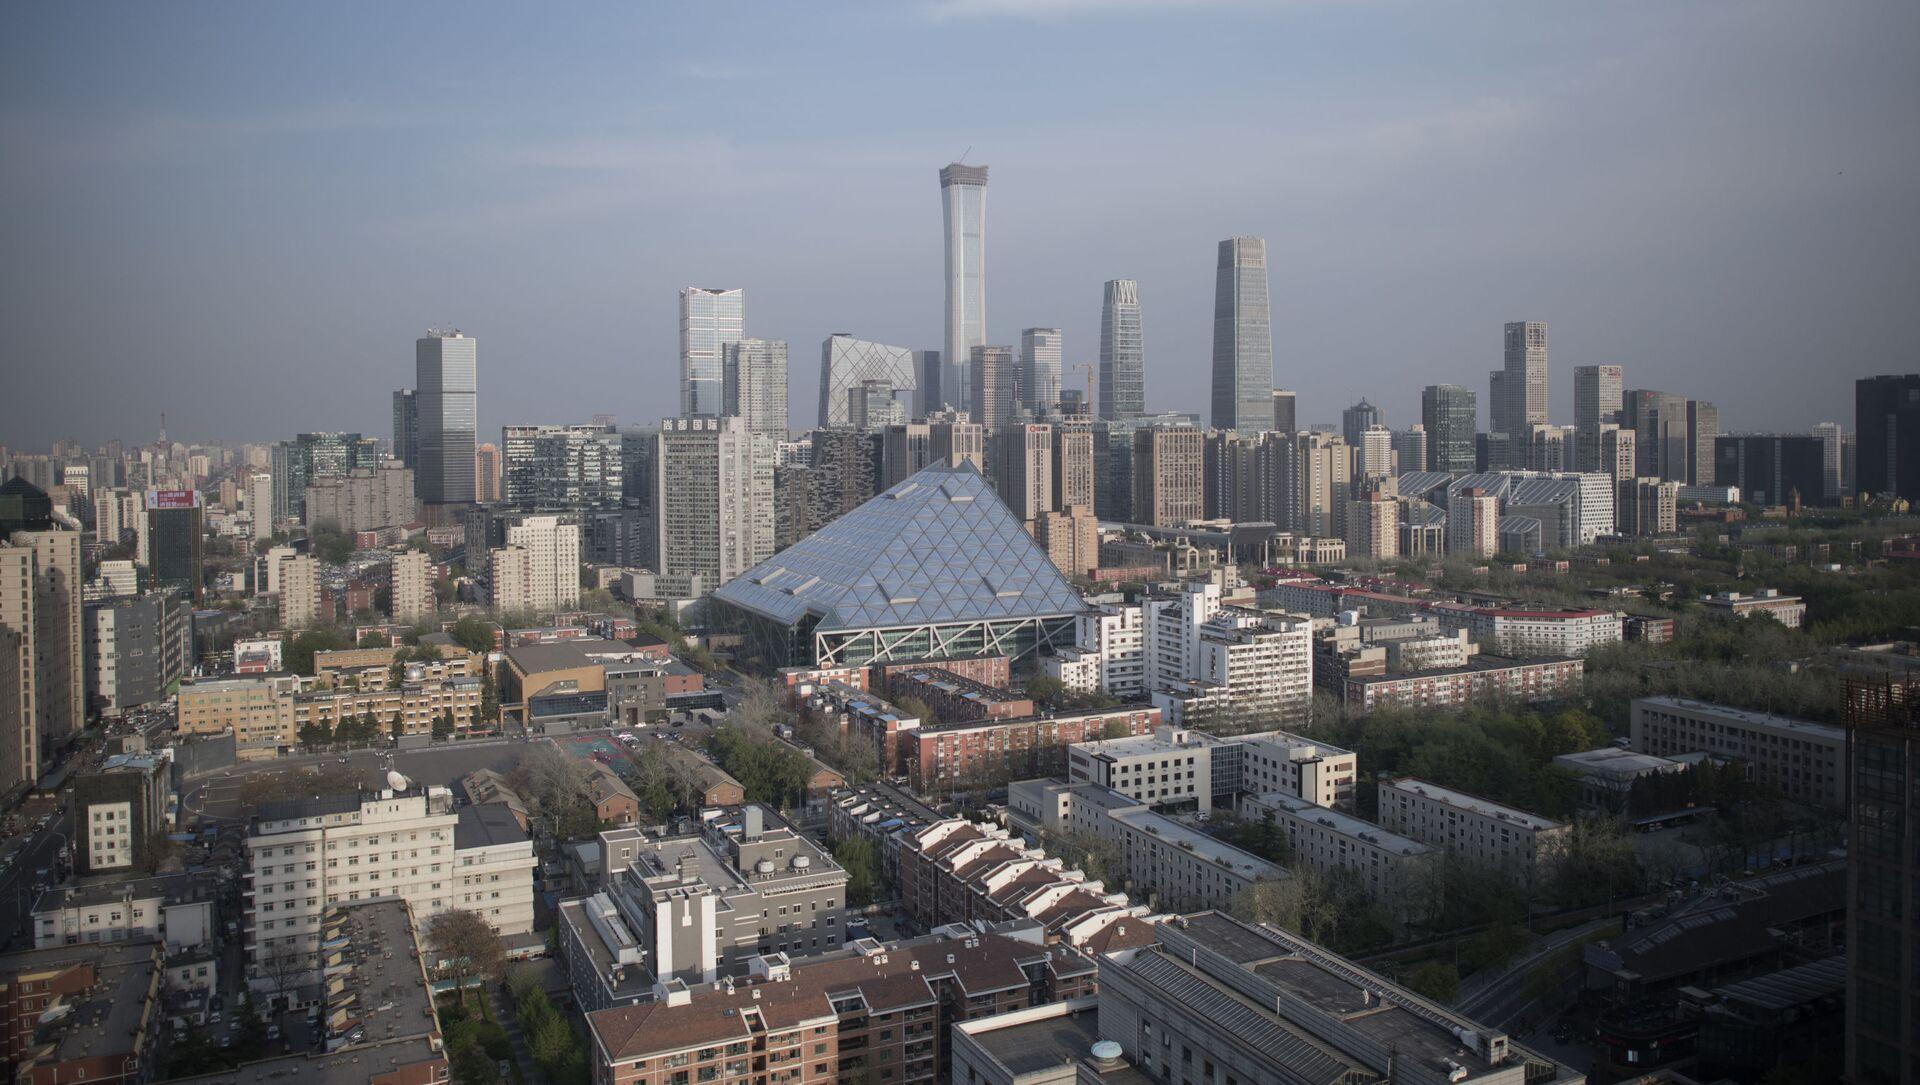 Вид на город Пекин, фото из архива - Sputnik Azərbaycan, 1920, 22.09.2021